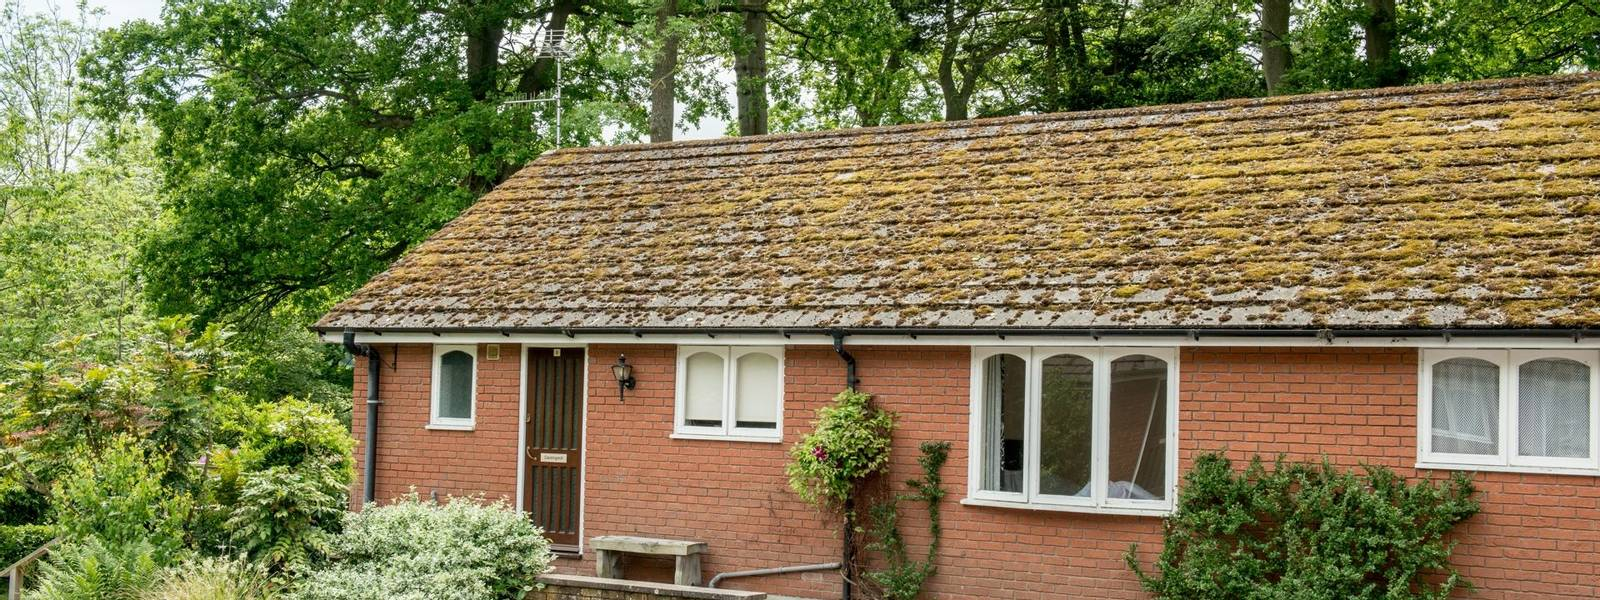 10694_0079 - Longmynd House - Lodge